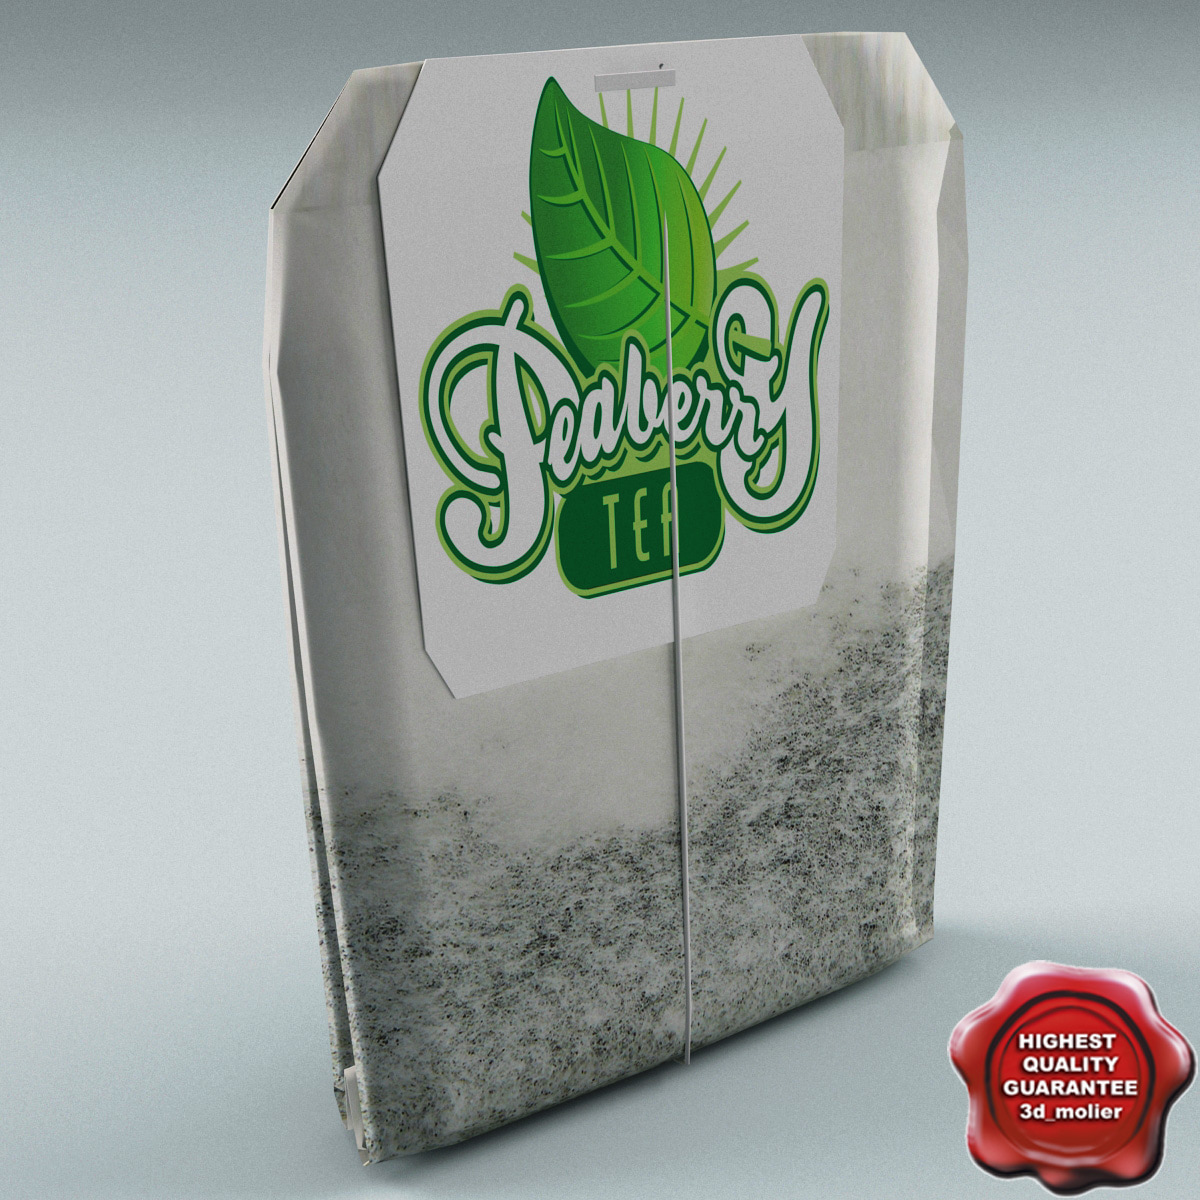 Tea Bag Peaberry